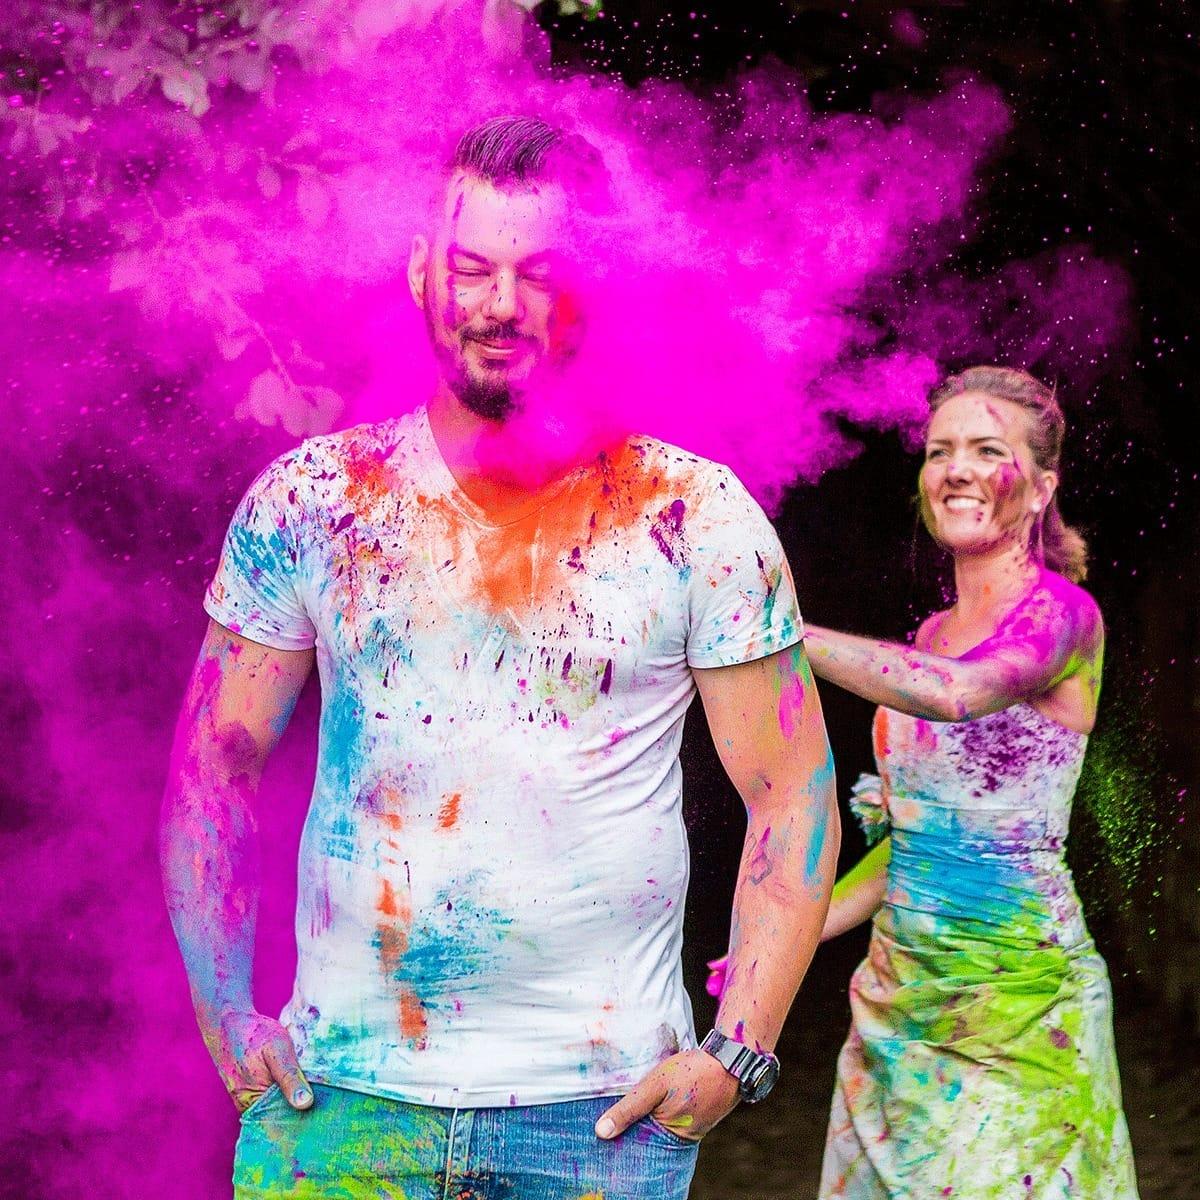 trash-the-dress-holi-kleurpoeder-powderbomb-4